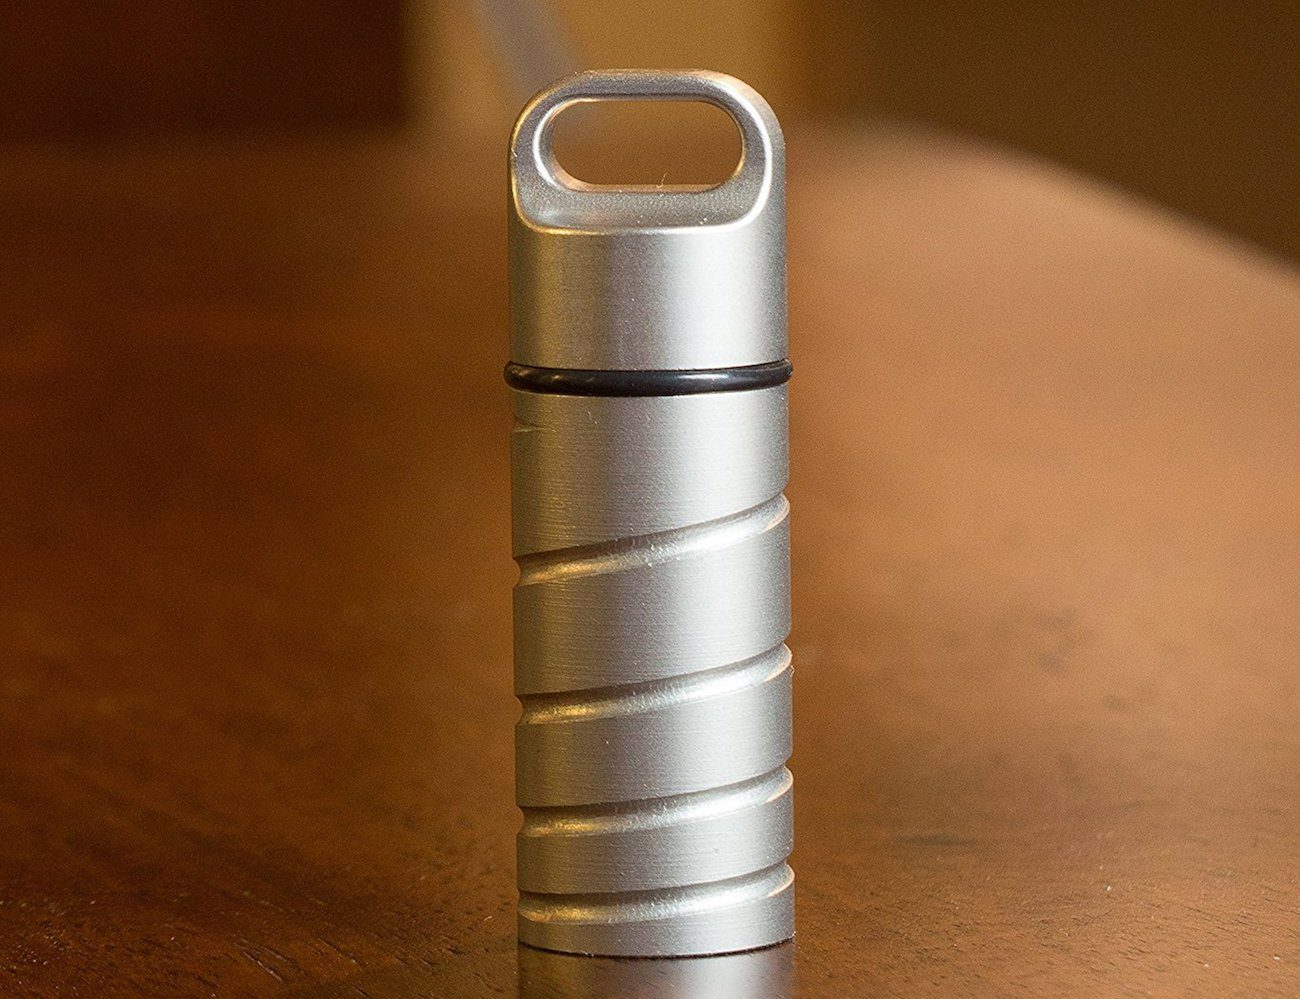 The Tin Mill Key Safe